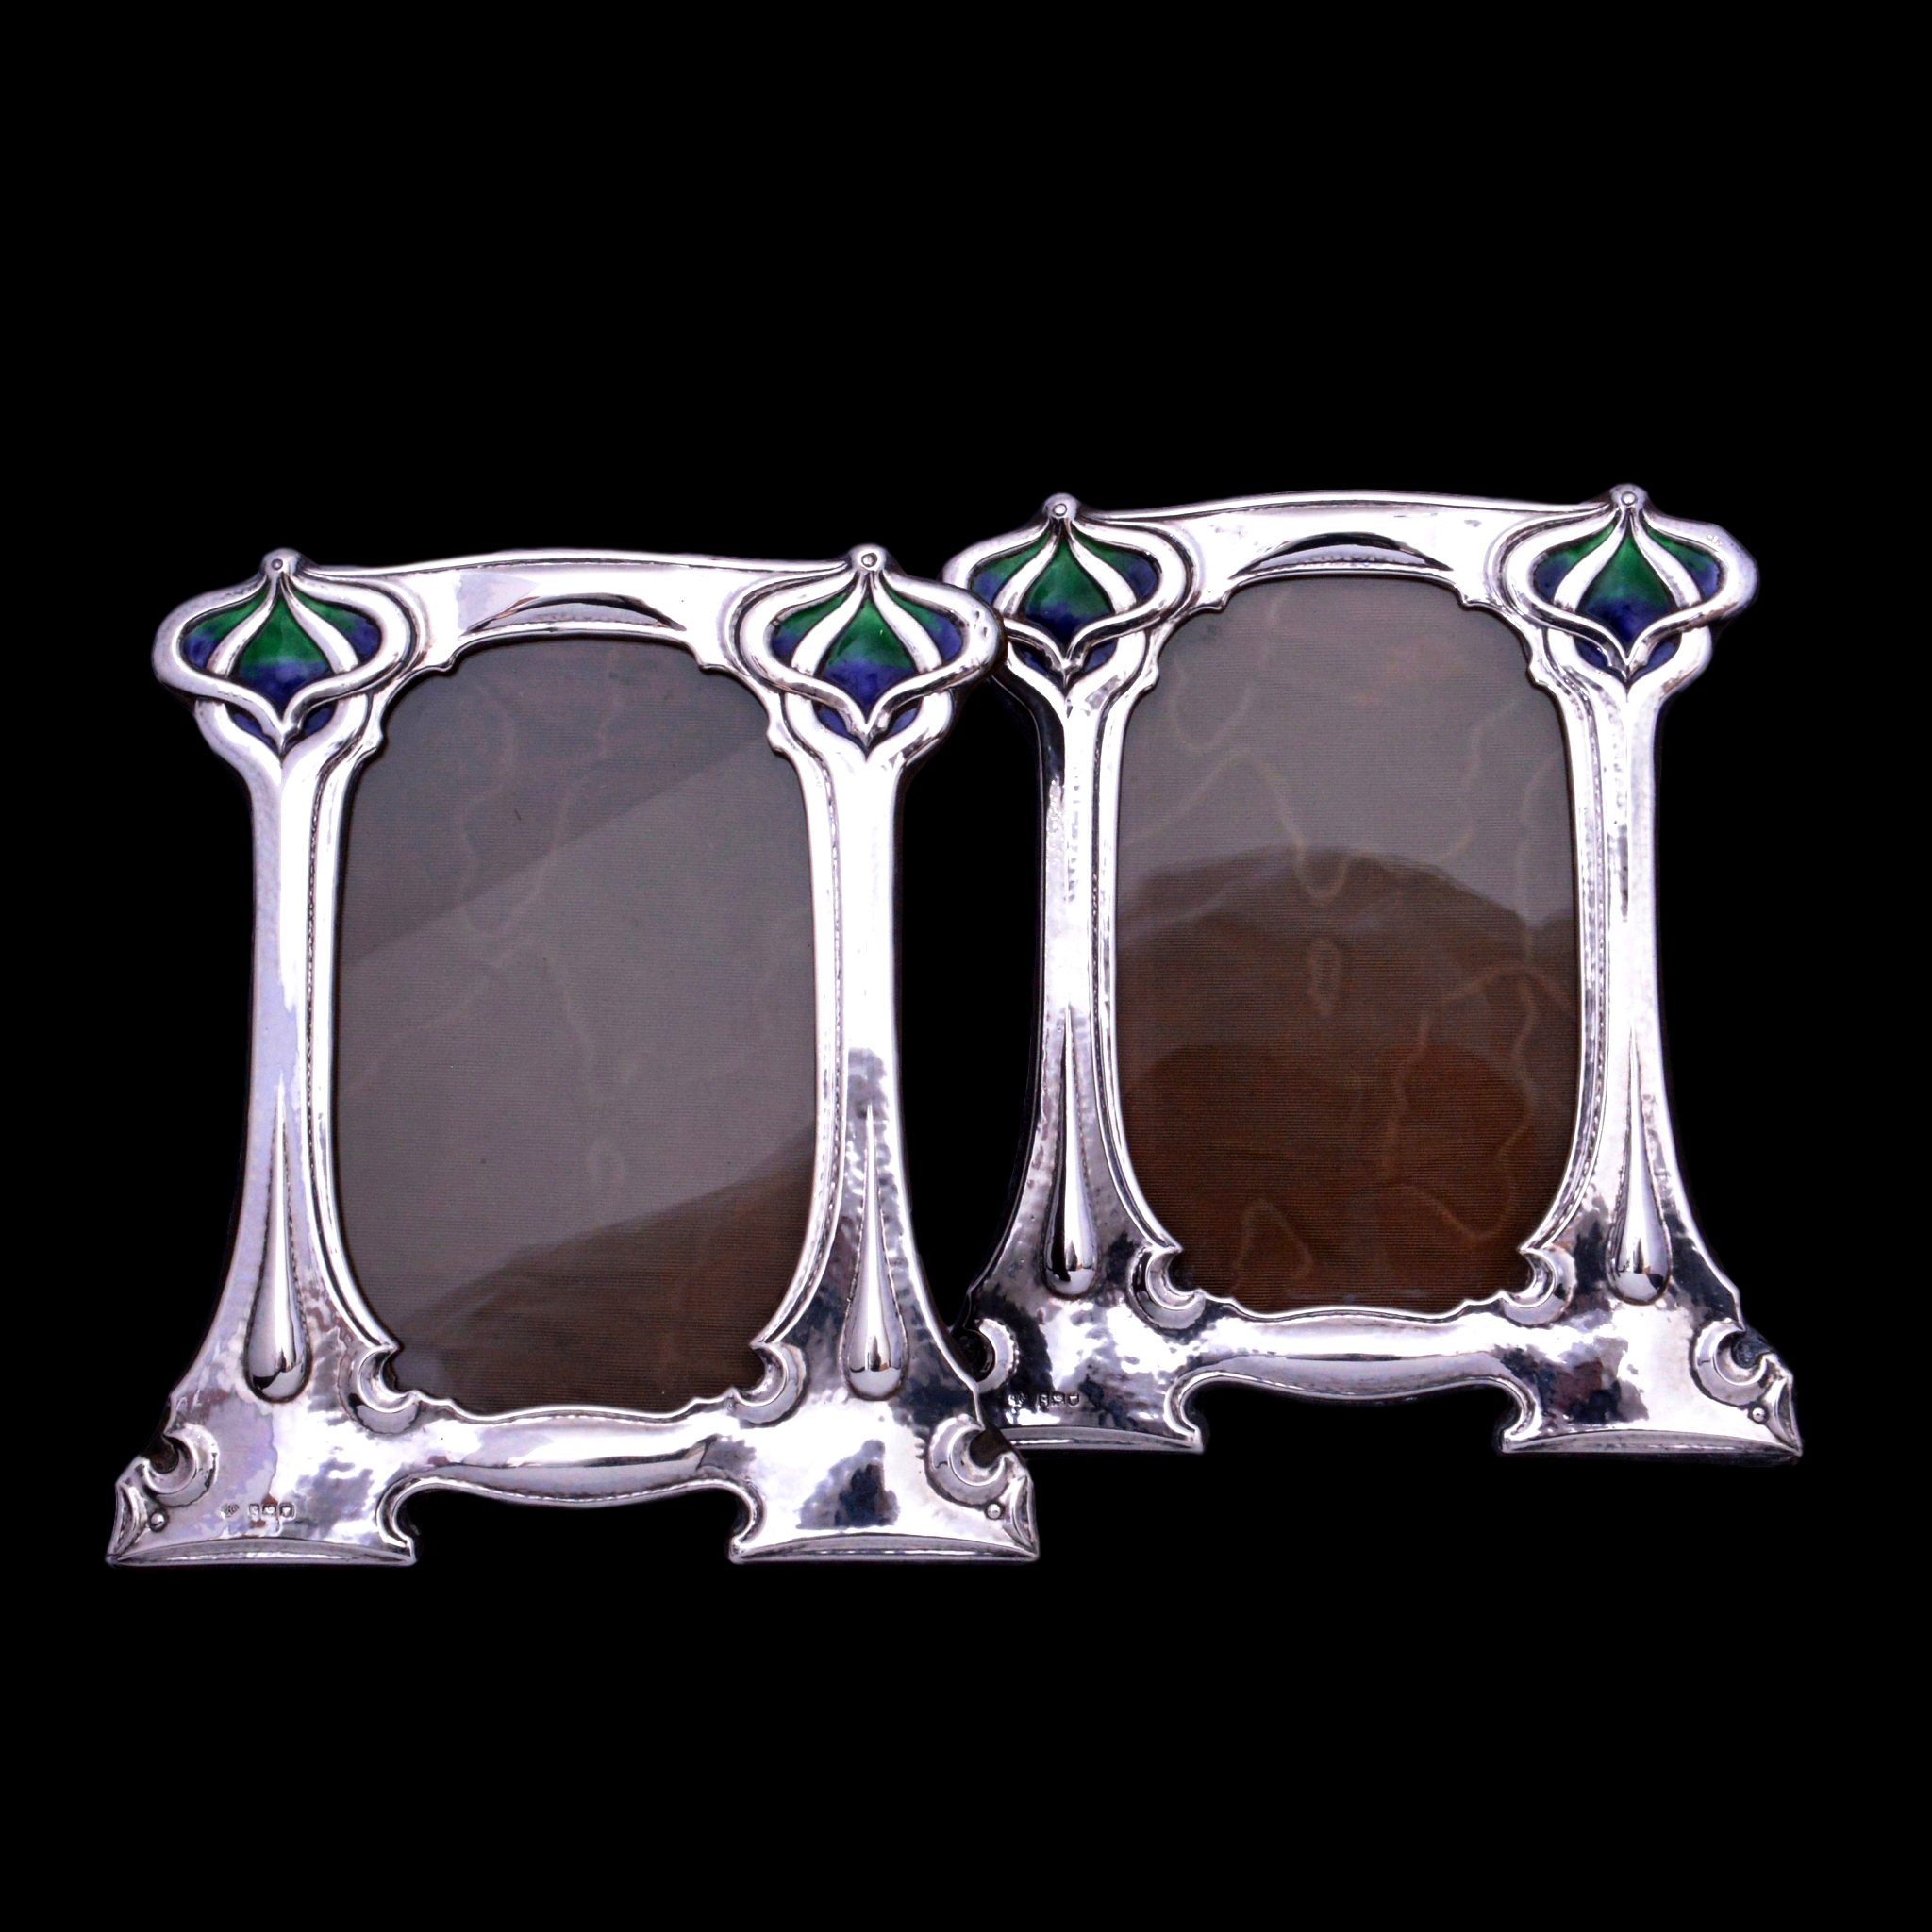 art nouveau silver photo frames, william hutton silver frames